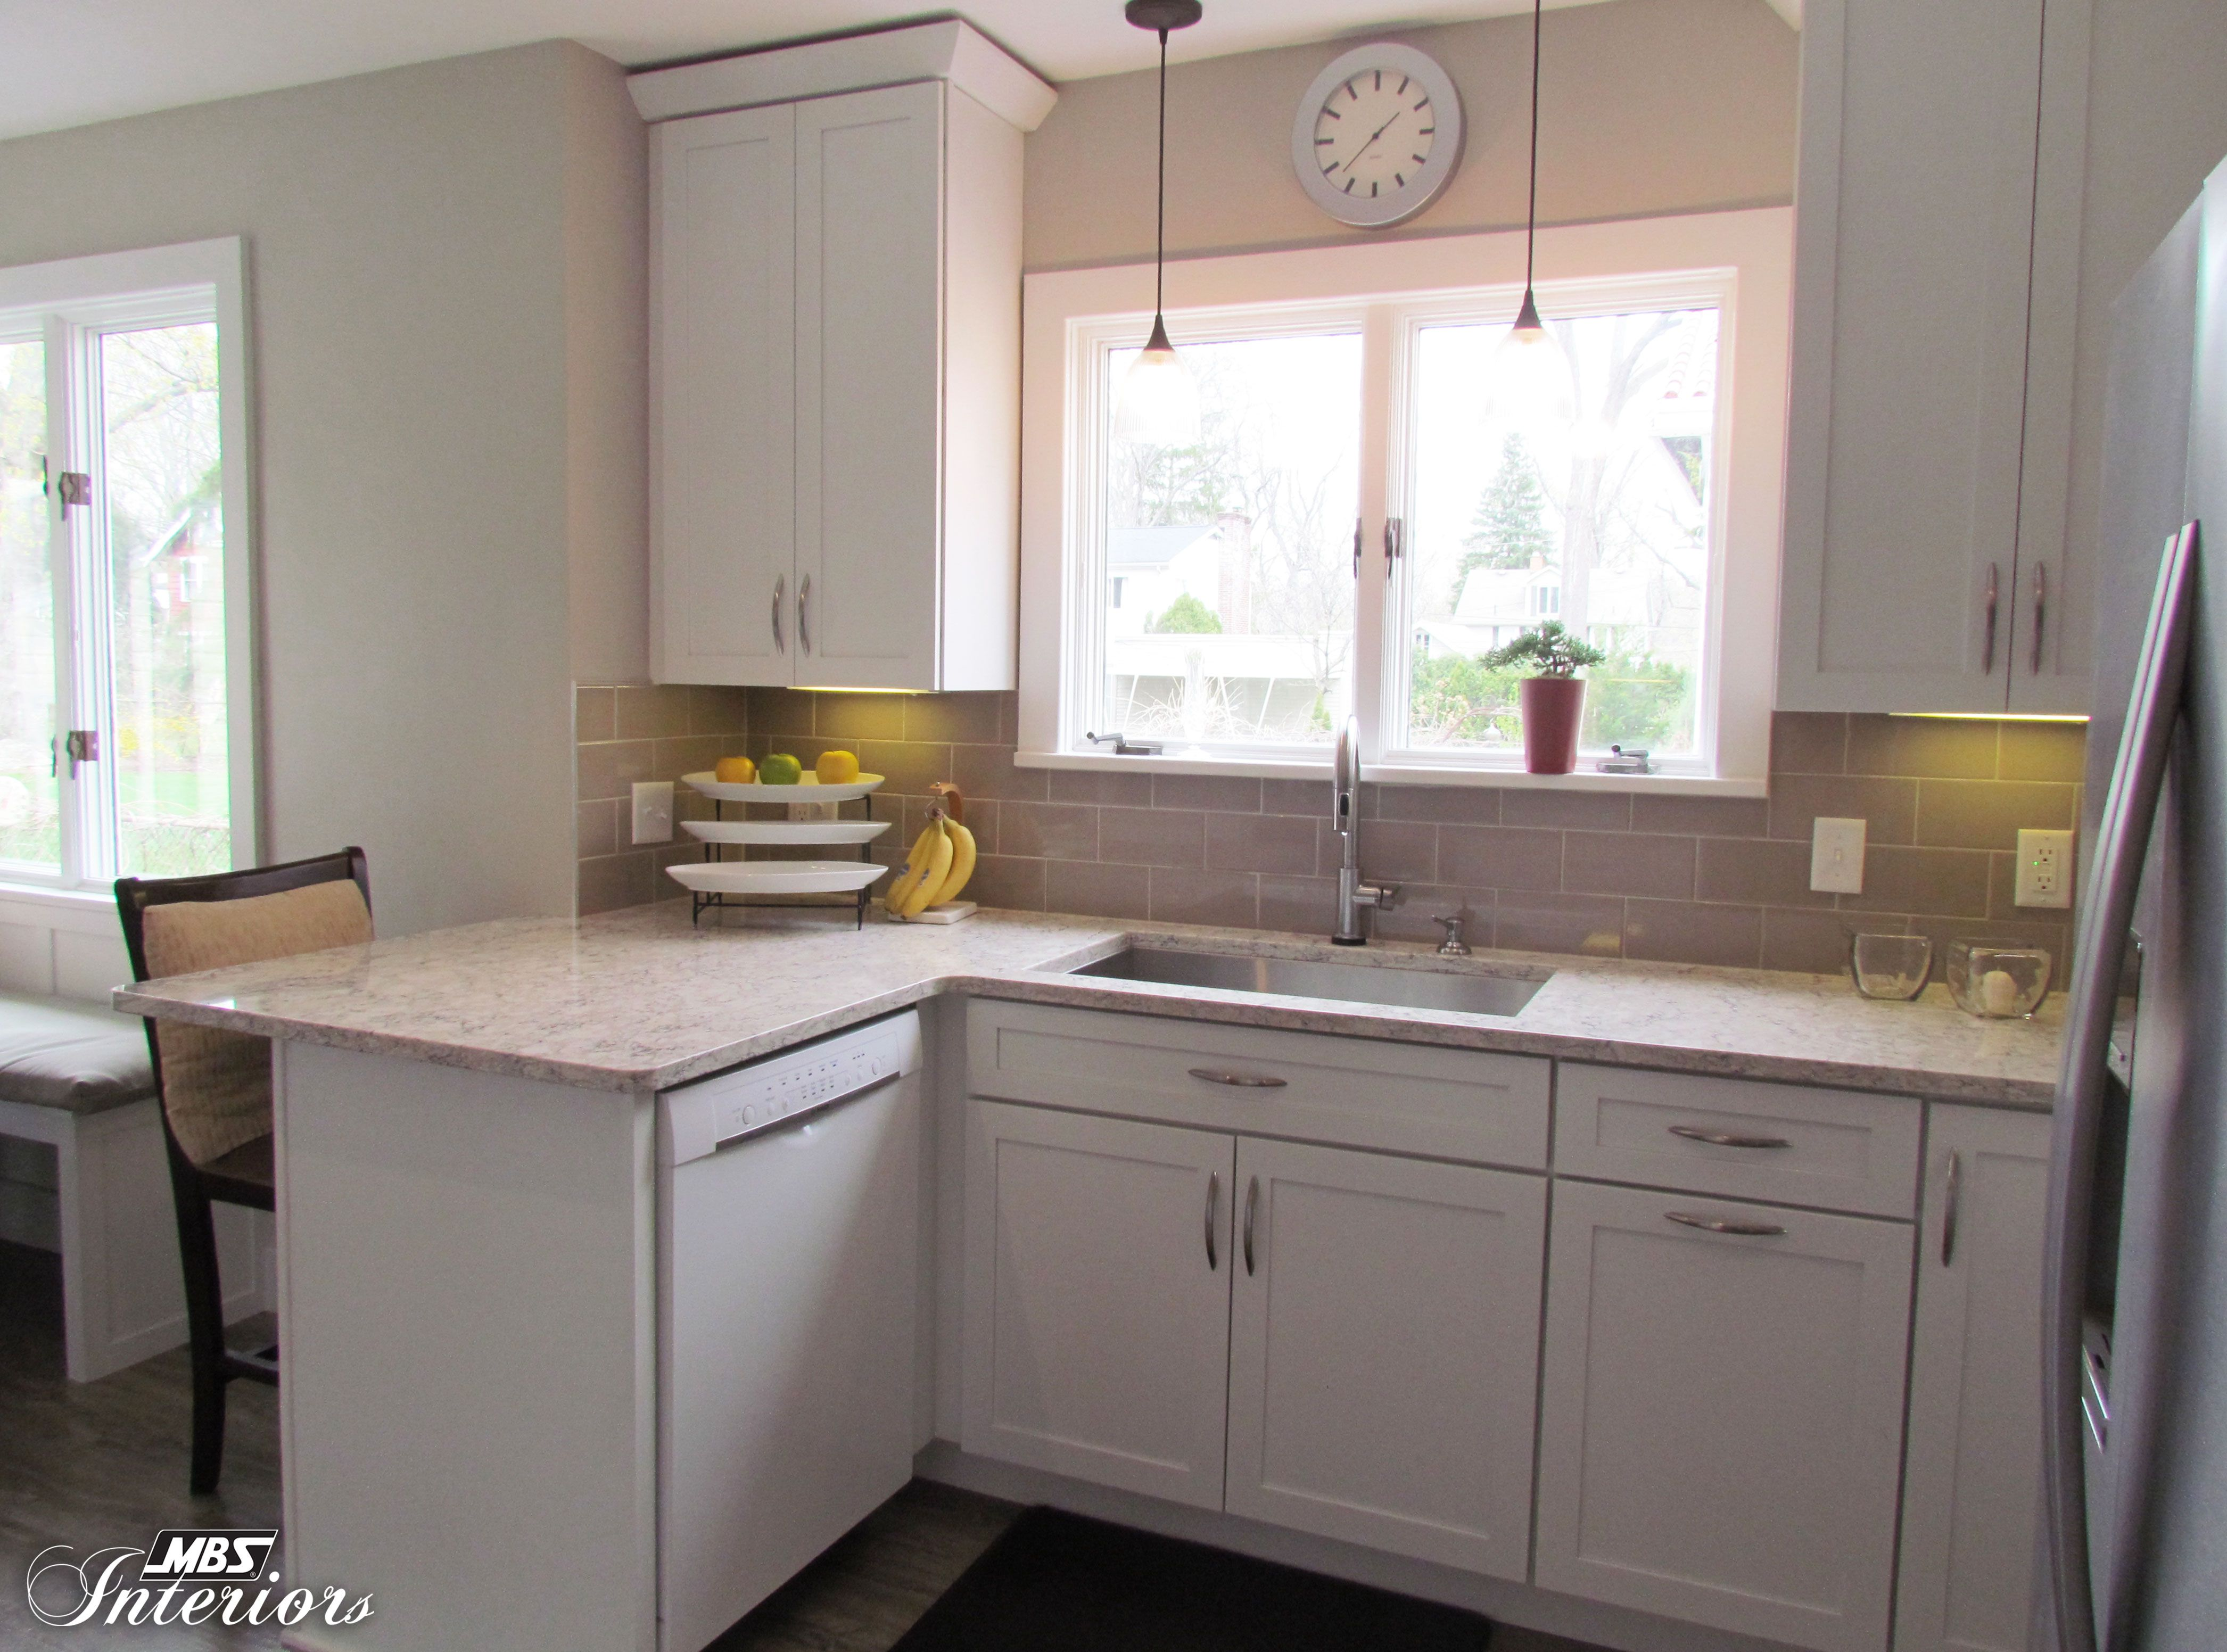 kraftmaid kitchen remodel toledo ohio mbs interiors kitchens